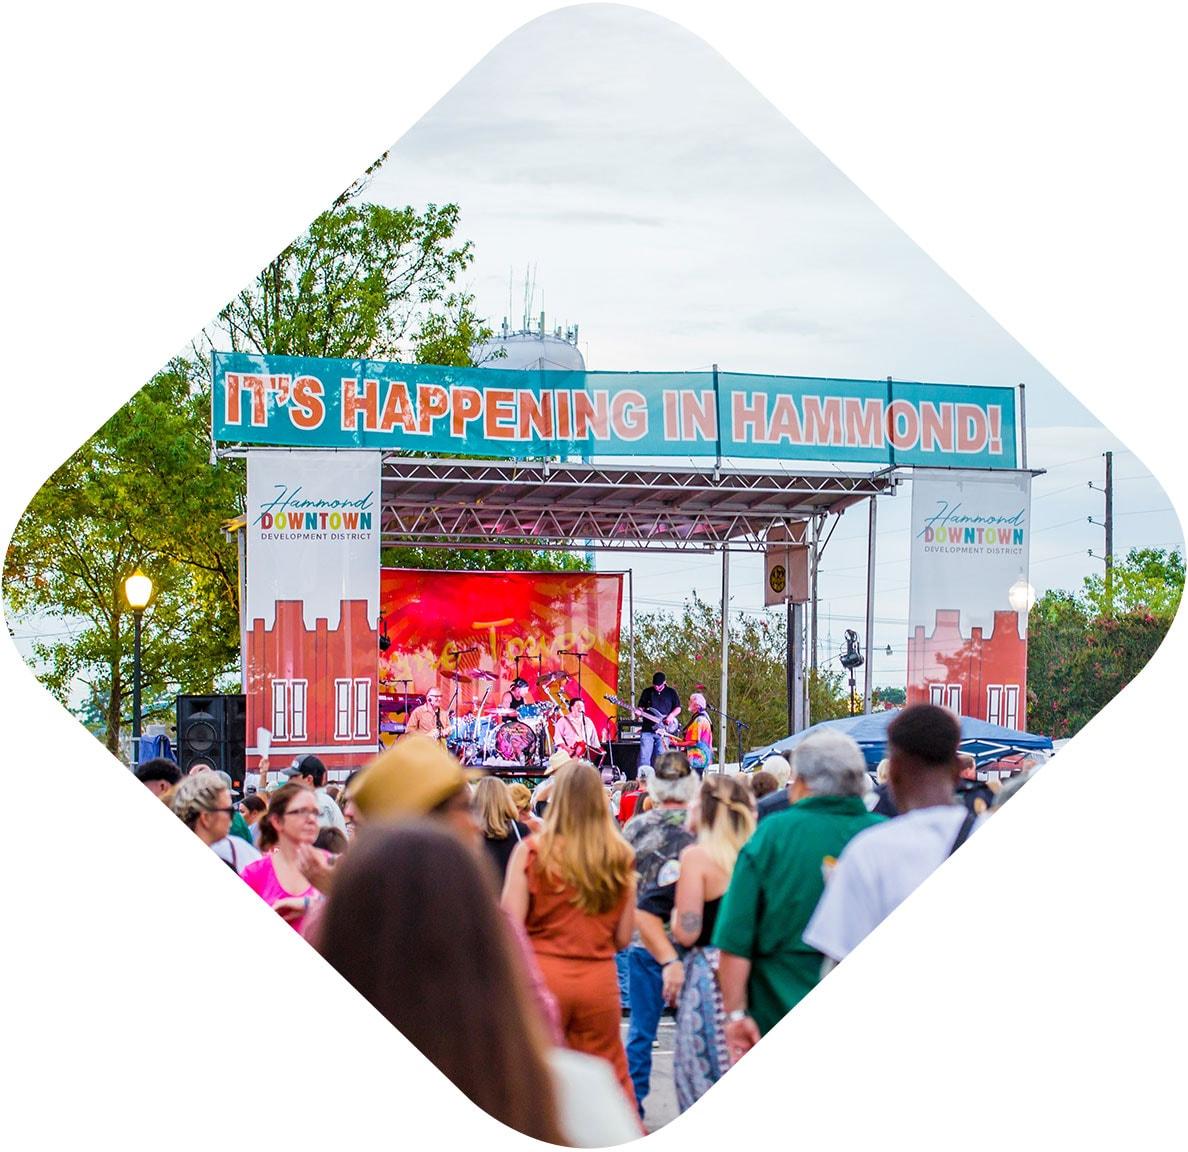 Hot Augusts Night 2018 concert in Hammond, LA